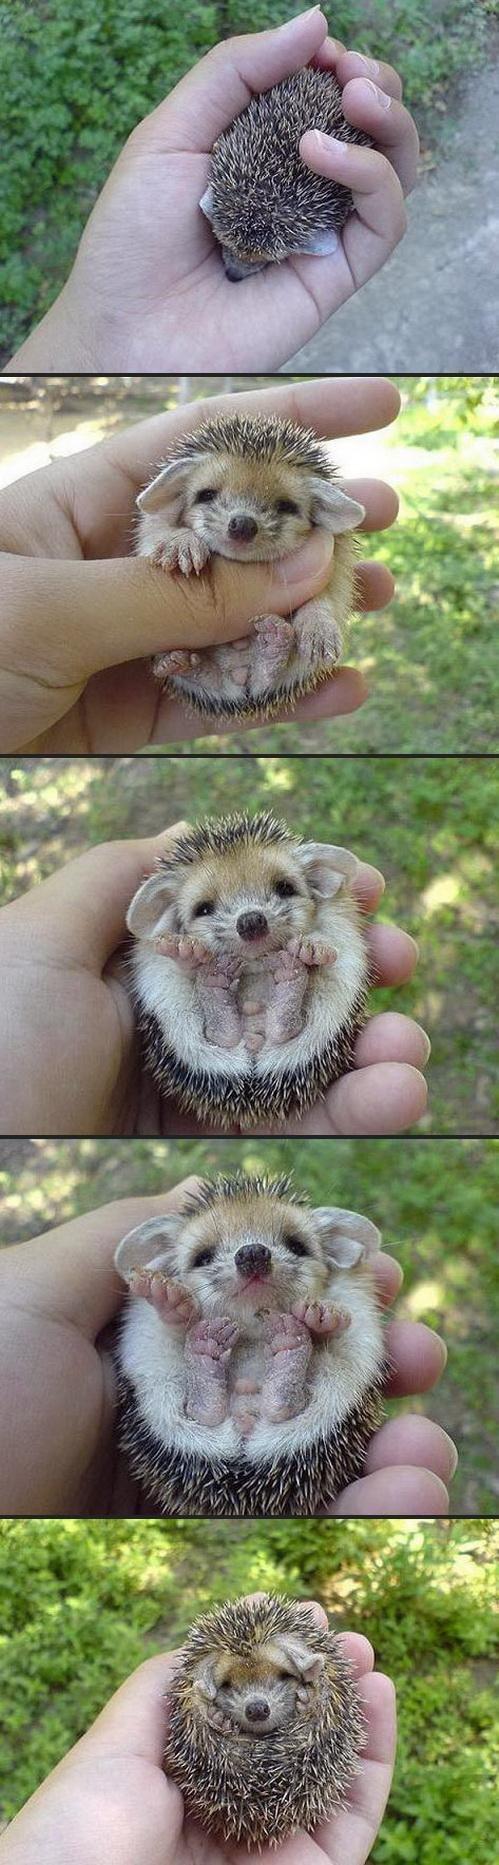 Hedgy the hog. Soooooooo adorable.. Funny how Sonic doesn't even look like a hedgehog.. O_o